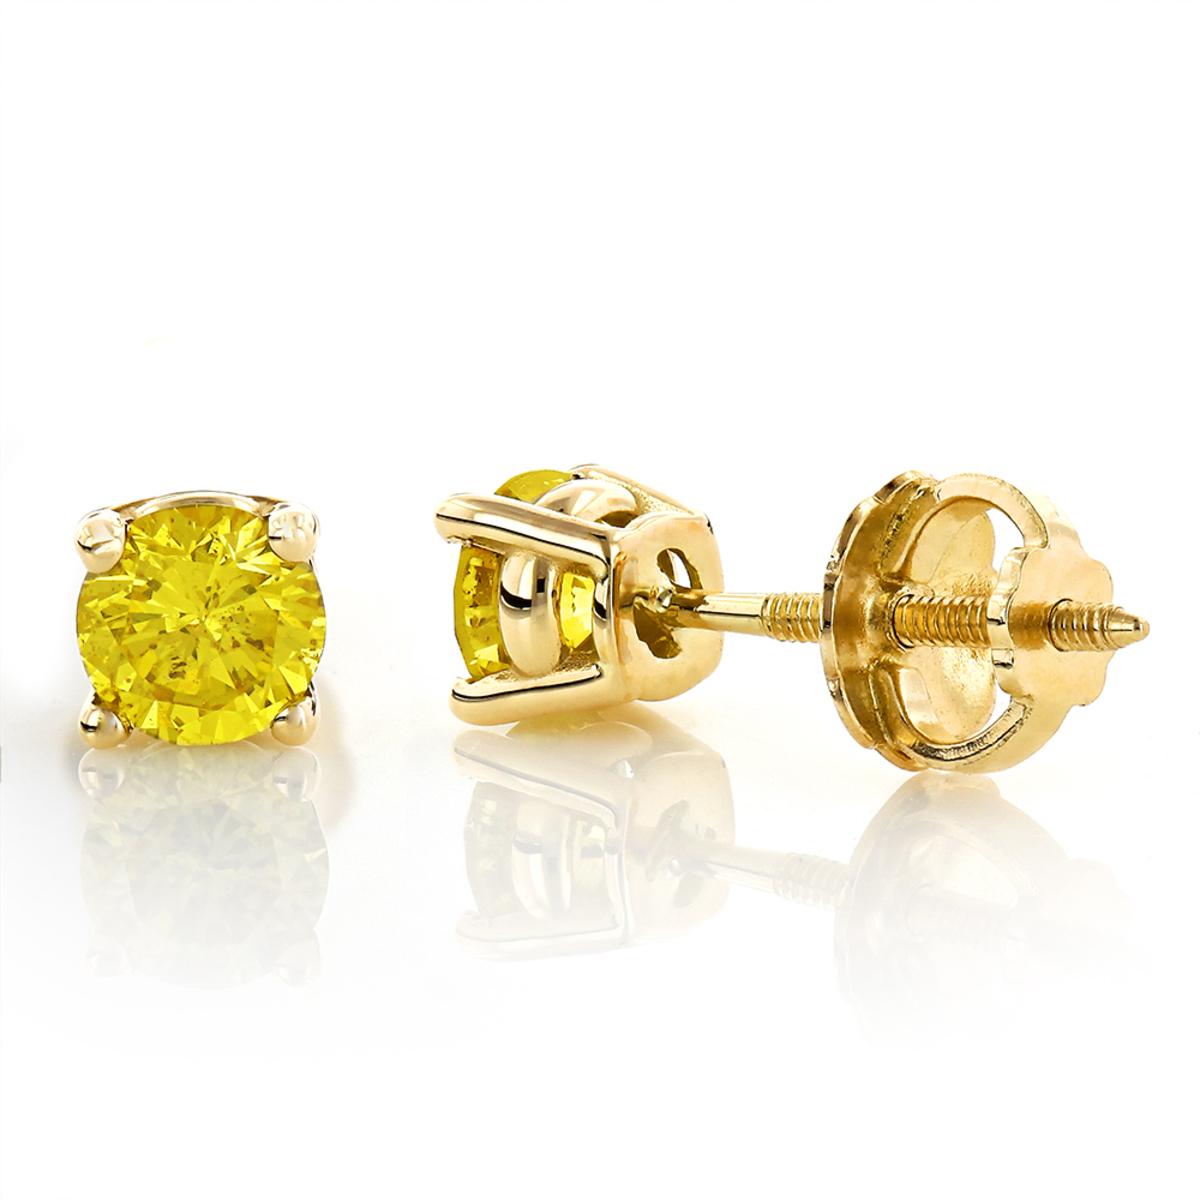 14K Round Canary Yellow Diamond Stud Earrings 1/2ct